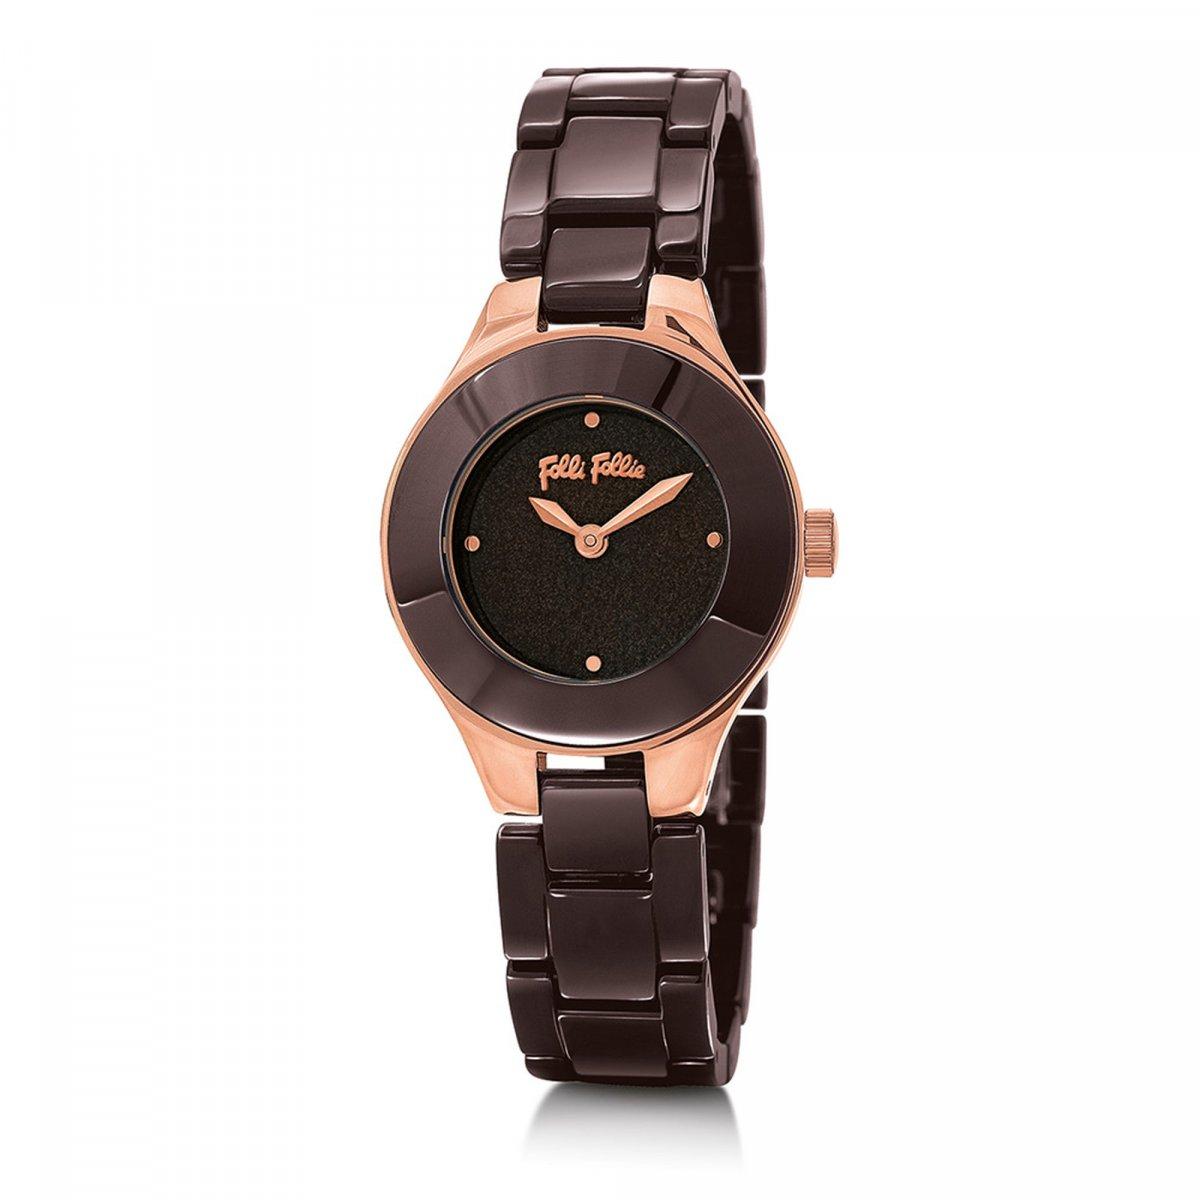 Hodinky FOLLI FOLLIE Miss FF Small Case Ceramic Bracelet Watch